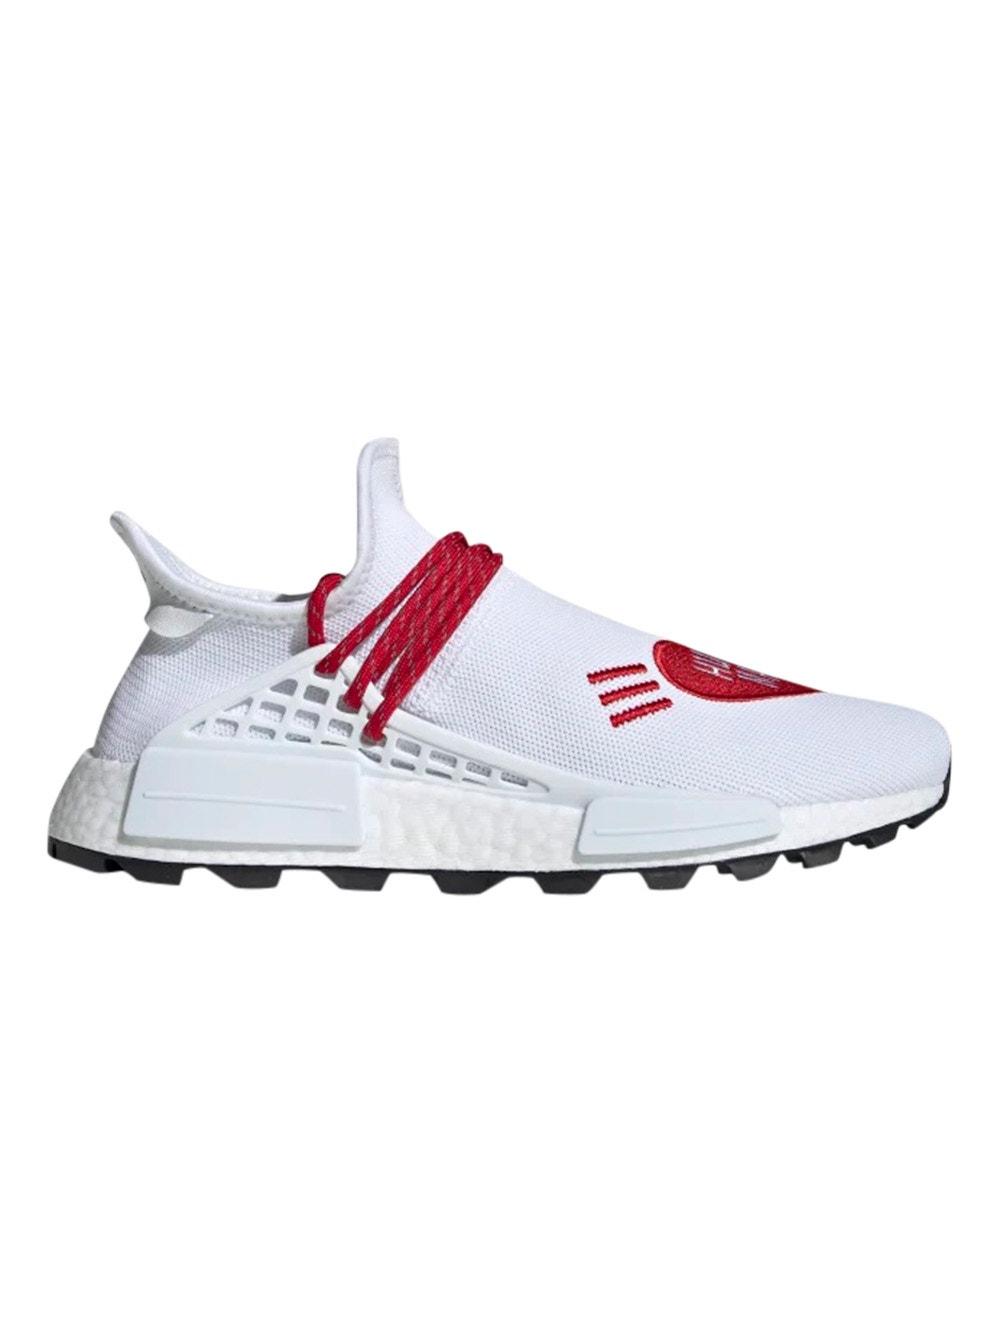 Adidas Pharrell Williams Human Race mens (USA 8) (UK 7.5